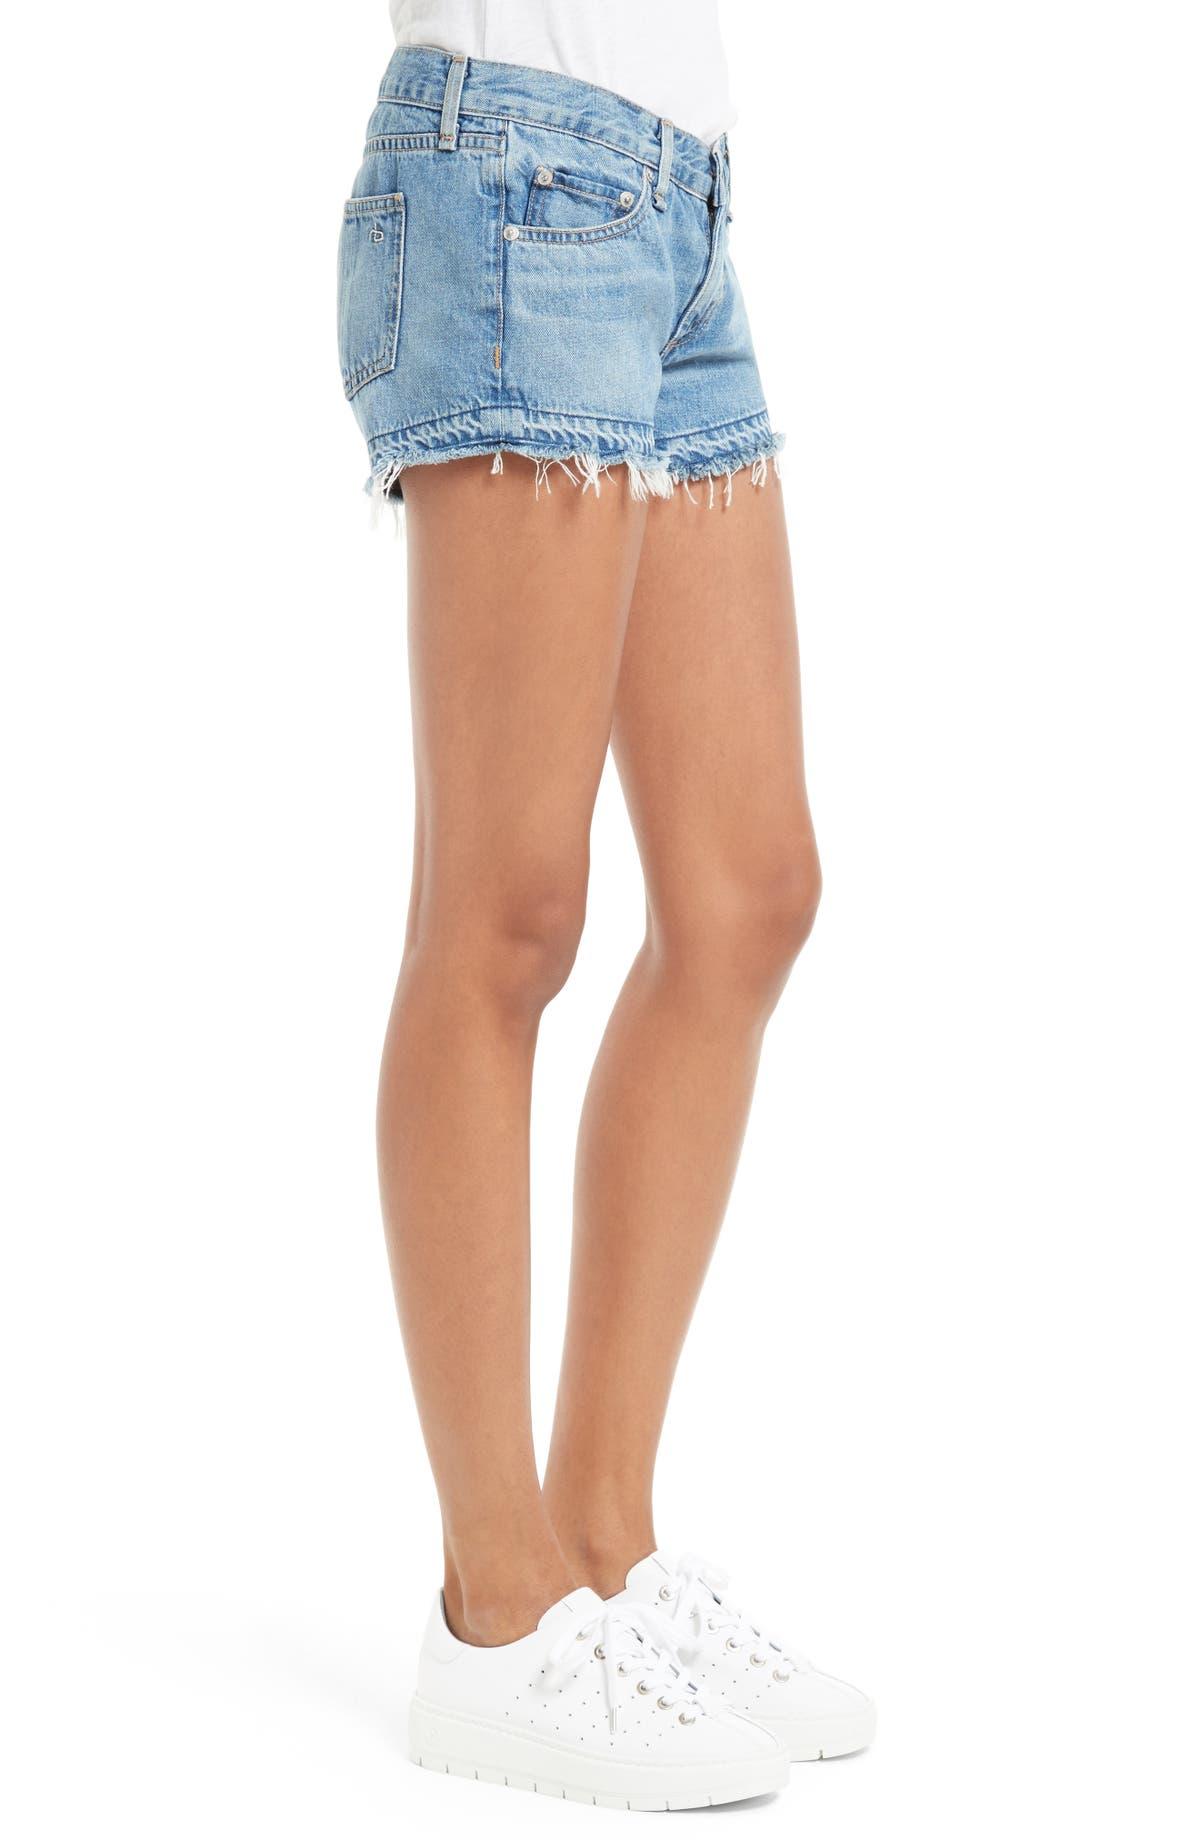 Released Shorts Jean Released Denim Hem Released Denim Hem Hem Jean Shorts Denim Jean mwN80n